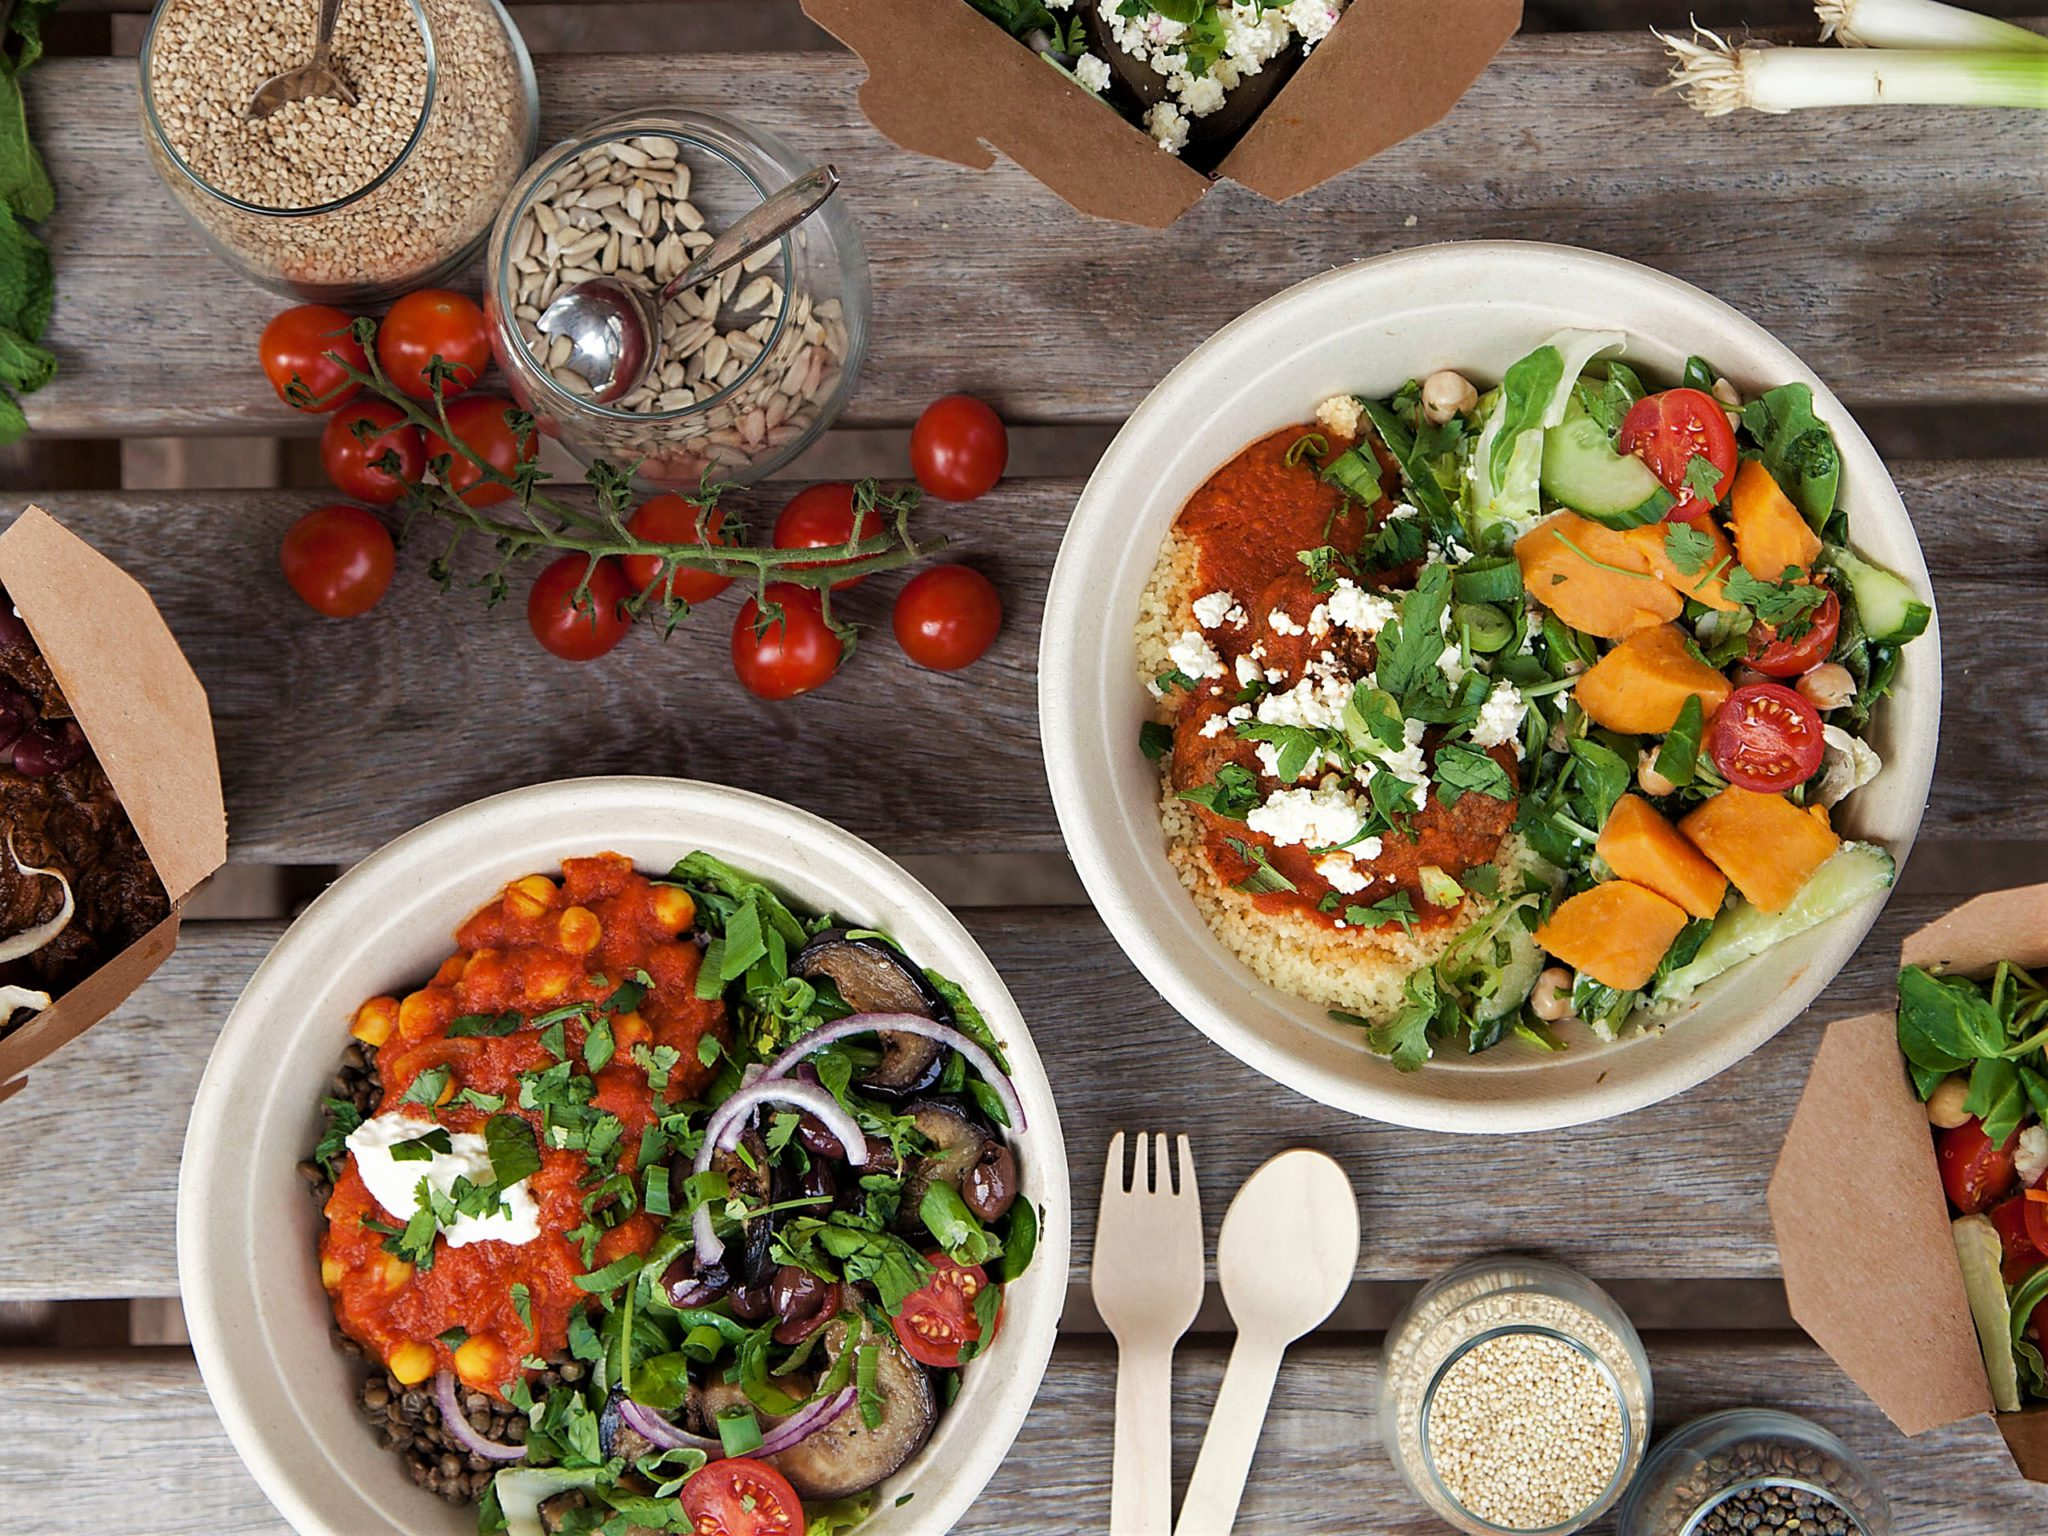 stewart & sally stoof en saladebar